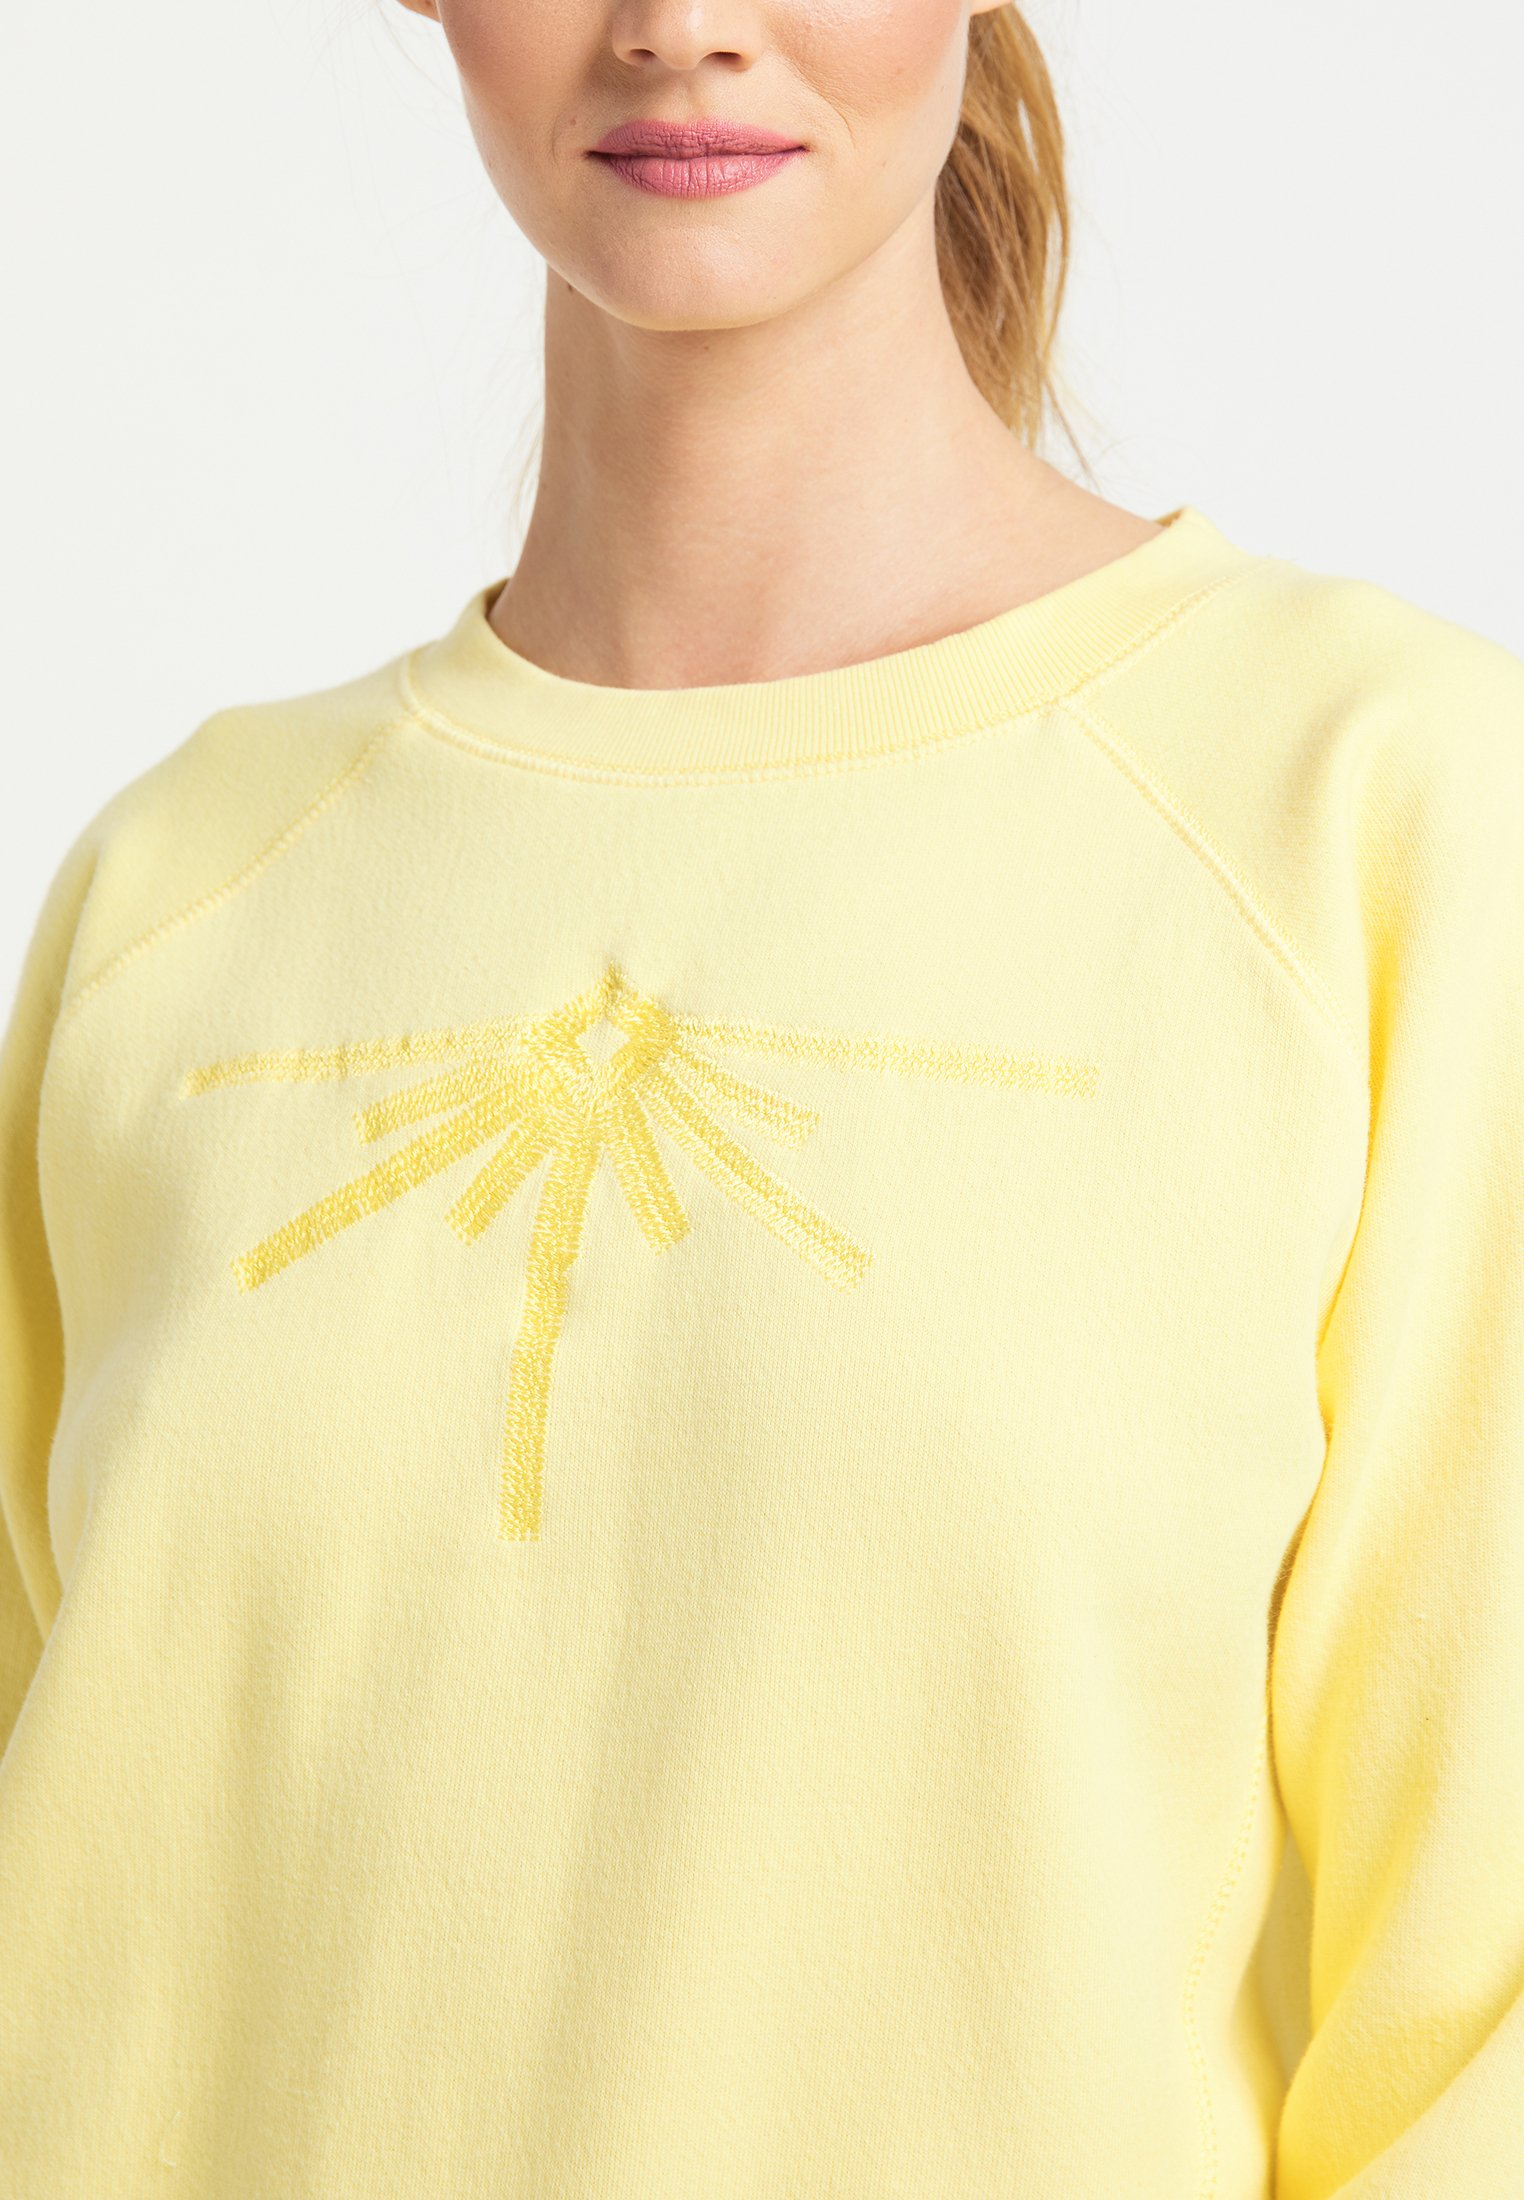 Petrol Industries Sweatshirt - Sweatshirts Mellow Yellow